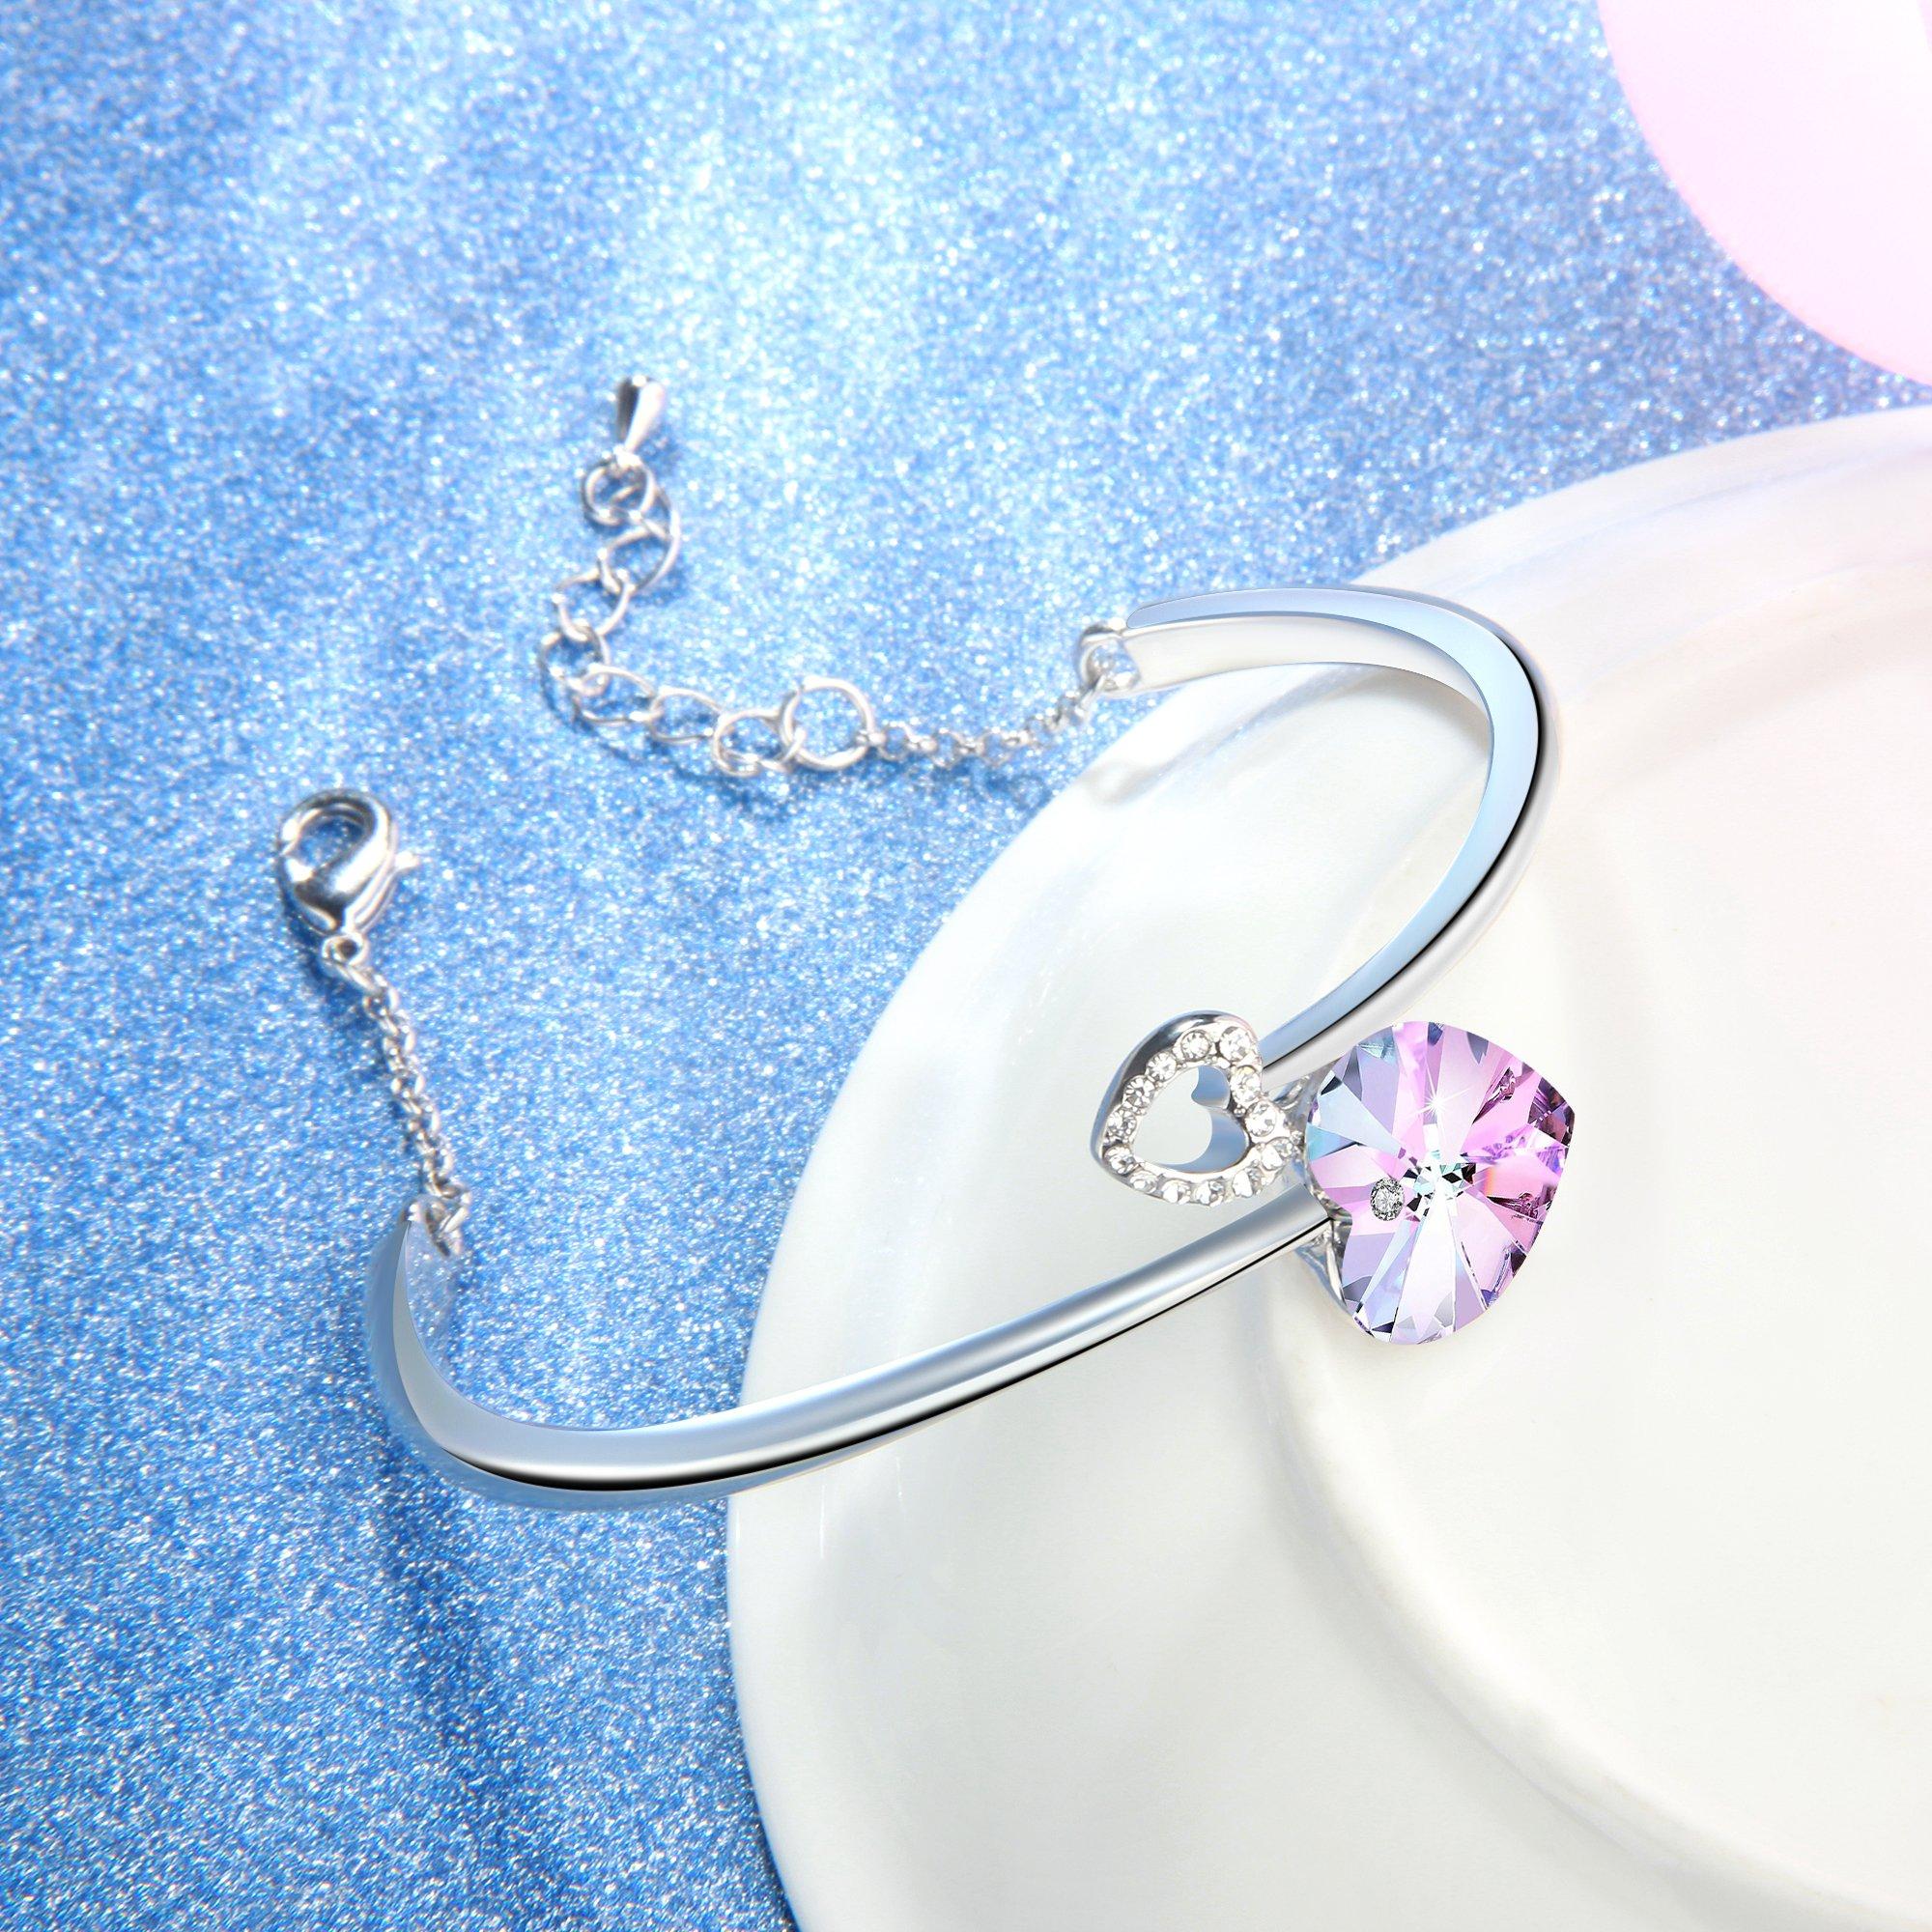 Angelady Love Story Heart Link Bangle Bracelet for Women Girl Birthday Anniversary Wedding Gifts,Adjust Chain Bracelet Graduation Anniversary Gift,Crystal from Swarovski (Purple Pink)